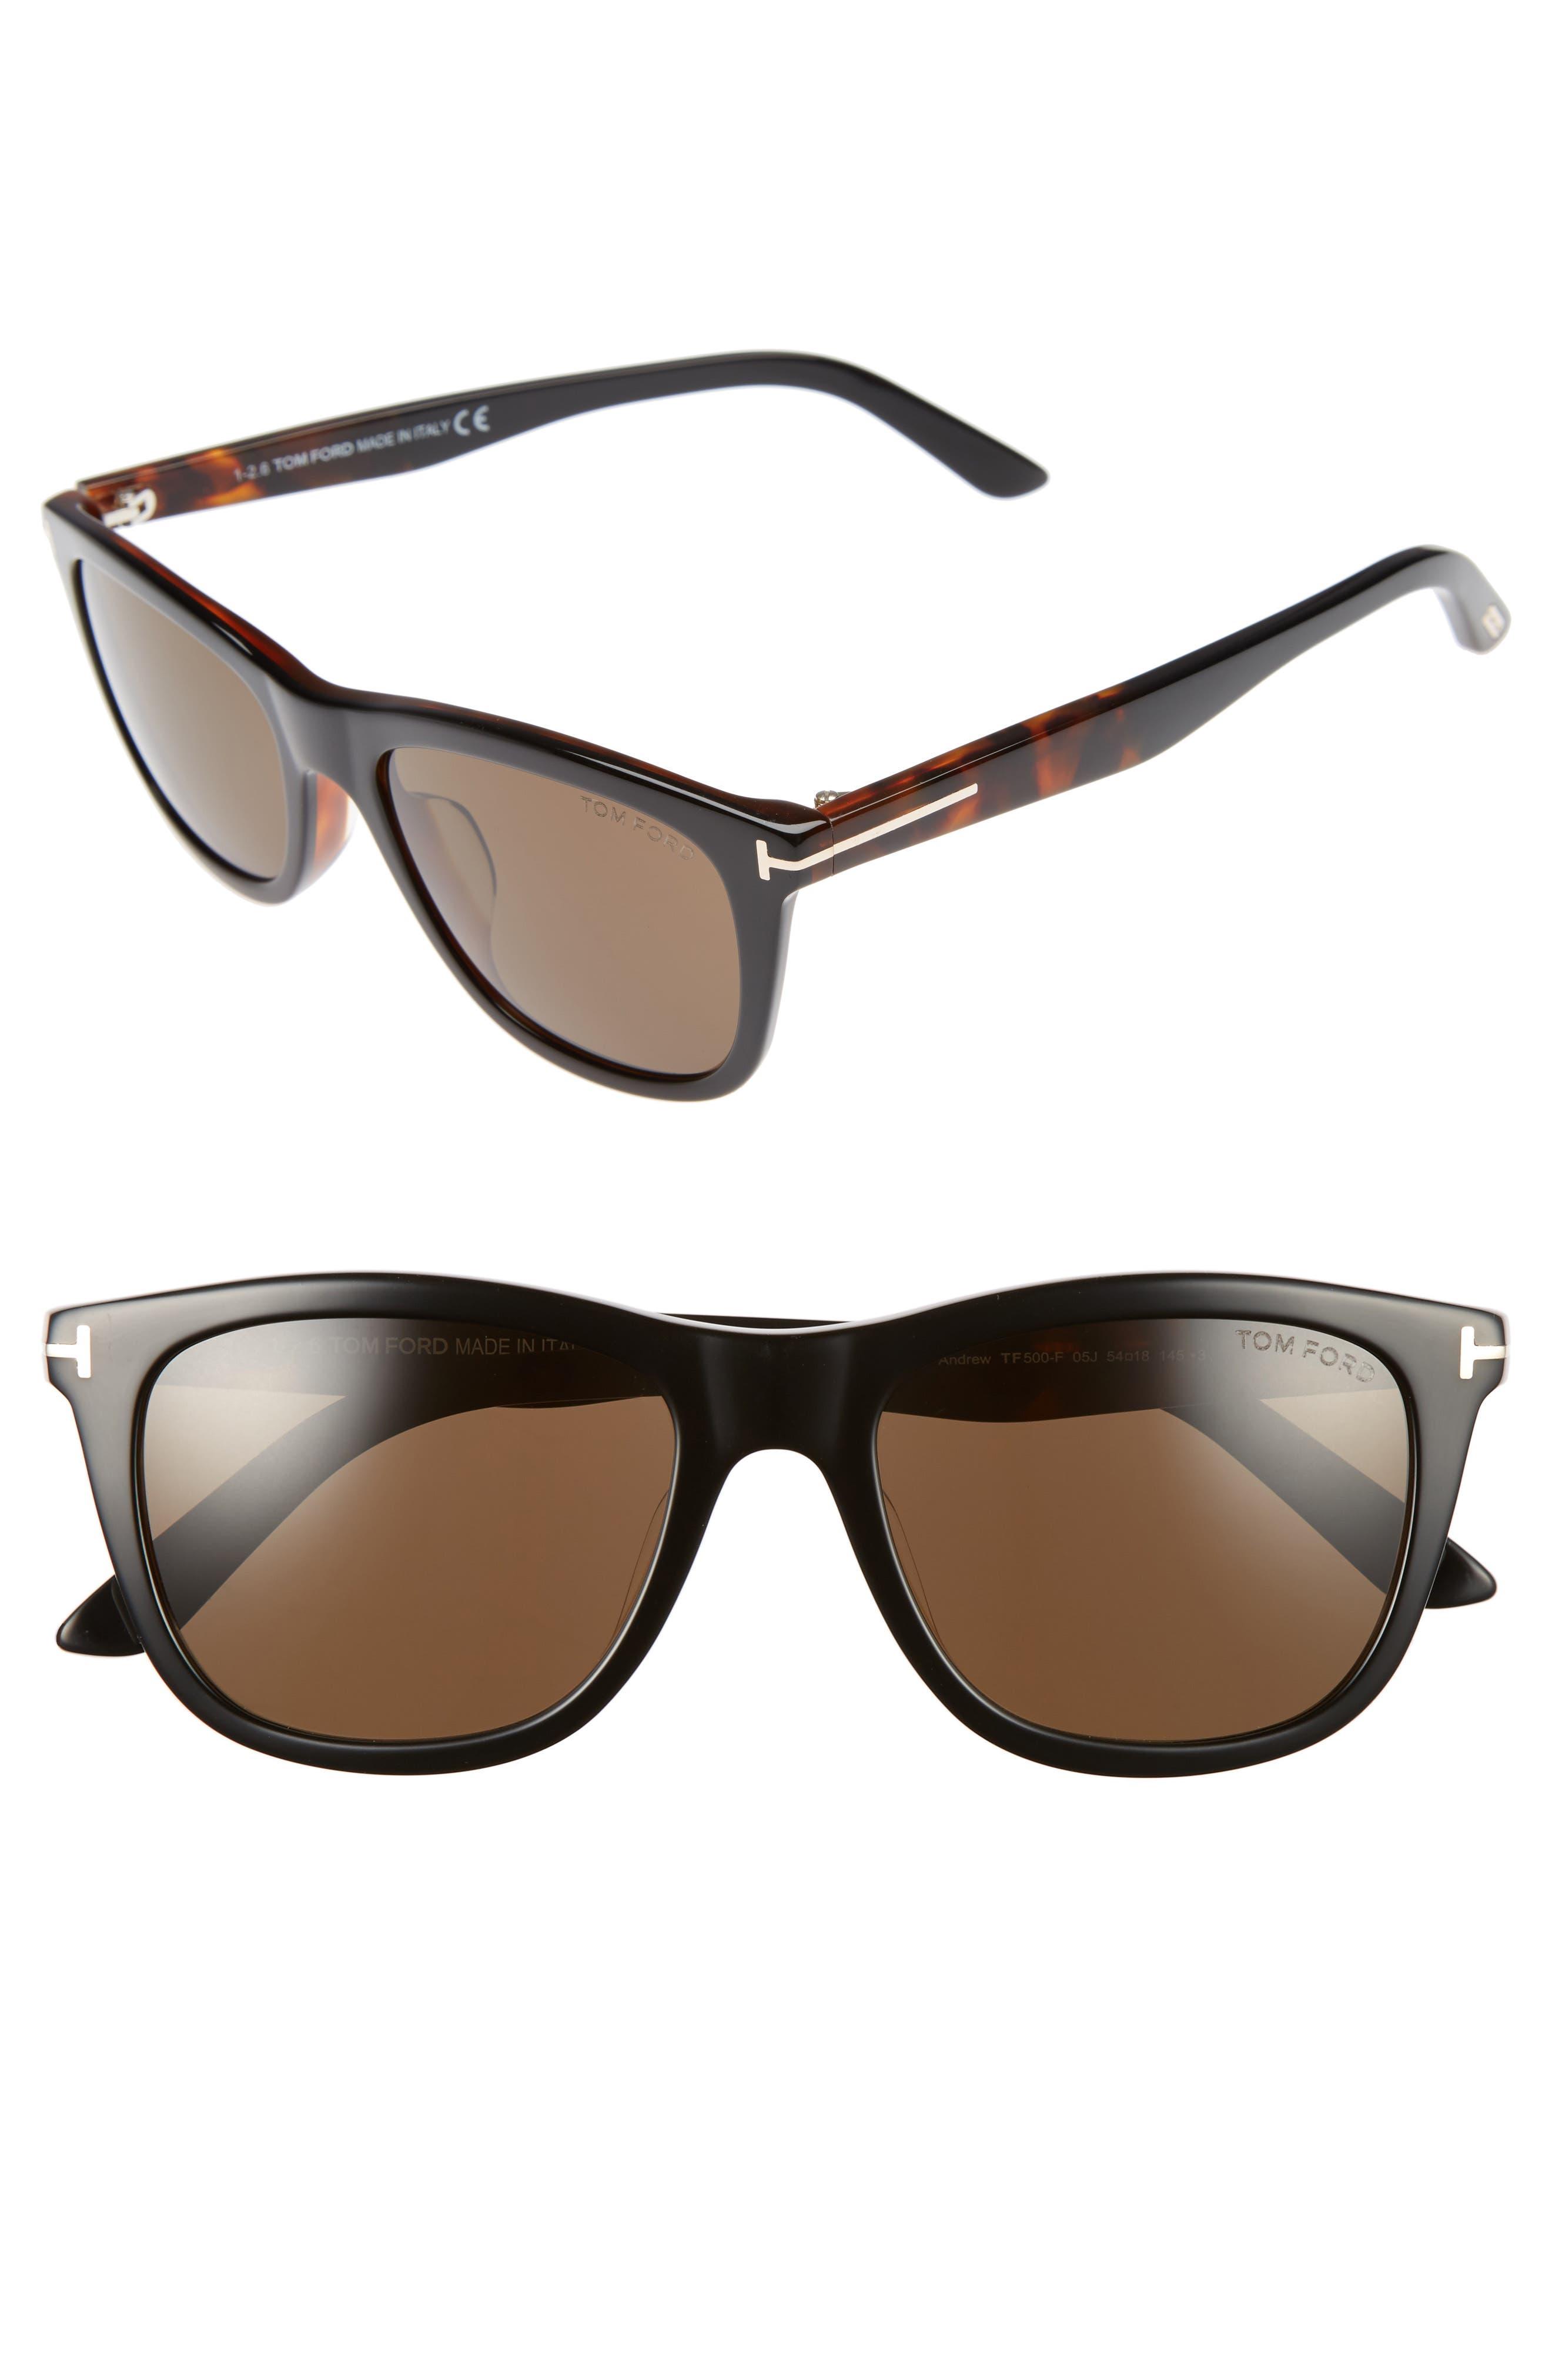 Andrew 54mm Rectangular Sunglasses,                         Main,                         color, Black/ Havana